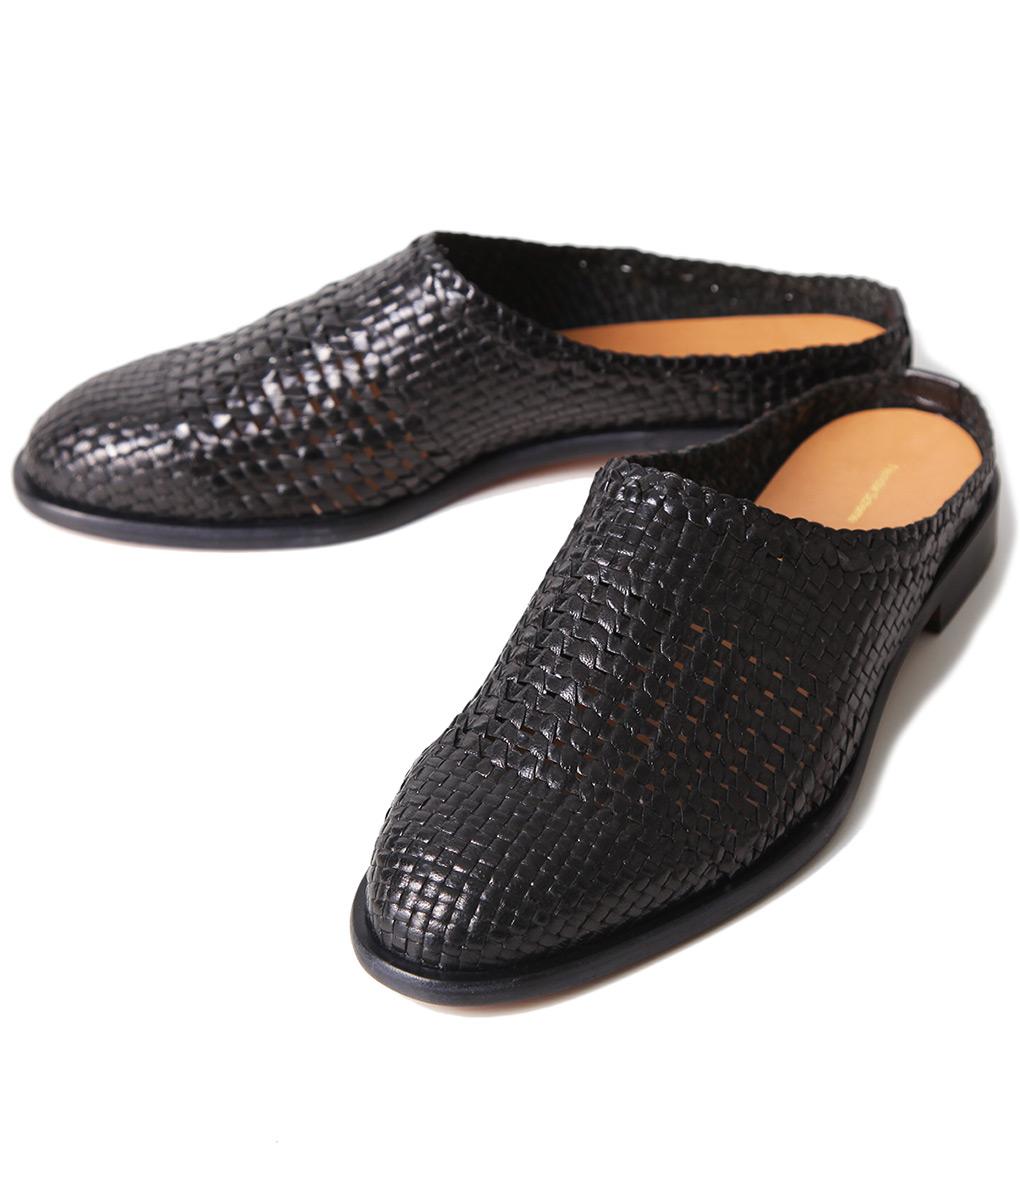 Hender Scheme / エンダースキーマ : hand mesh mule : エンダースキーマ ハンドメッシュ メイル レザーシューズ 靴 シューズ : nc-s-hmm-bjb 【BJB】